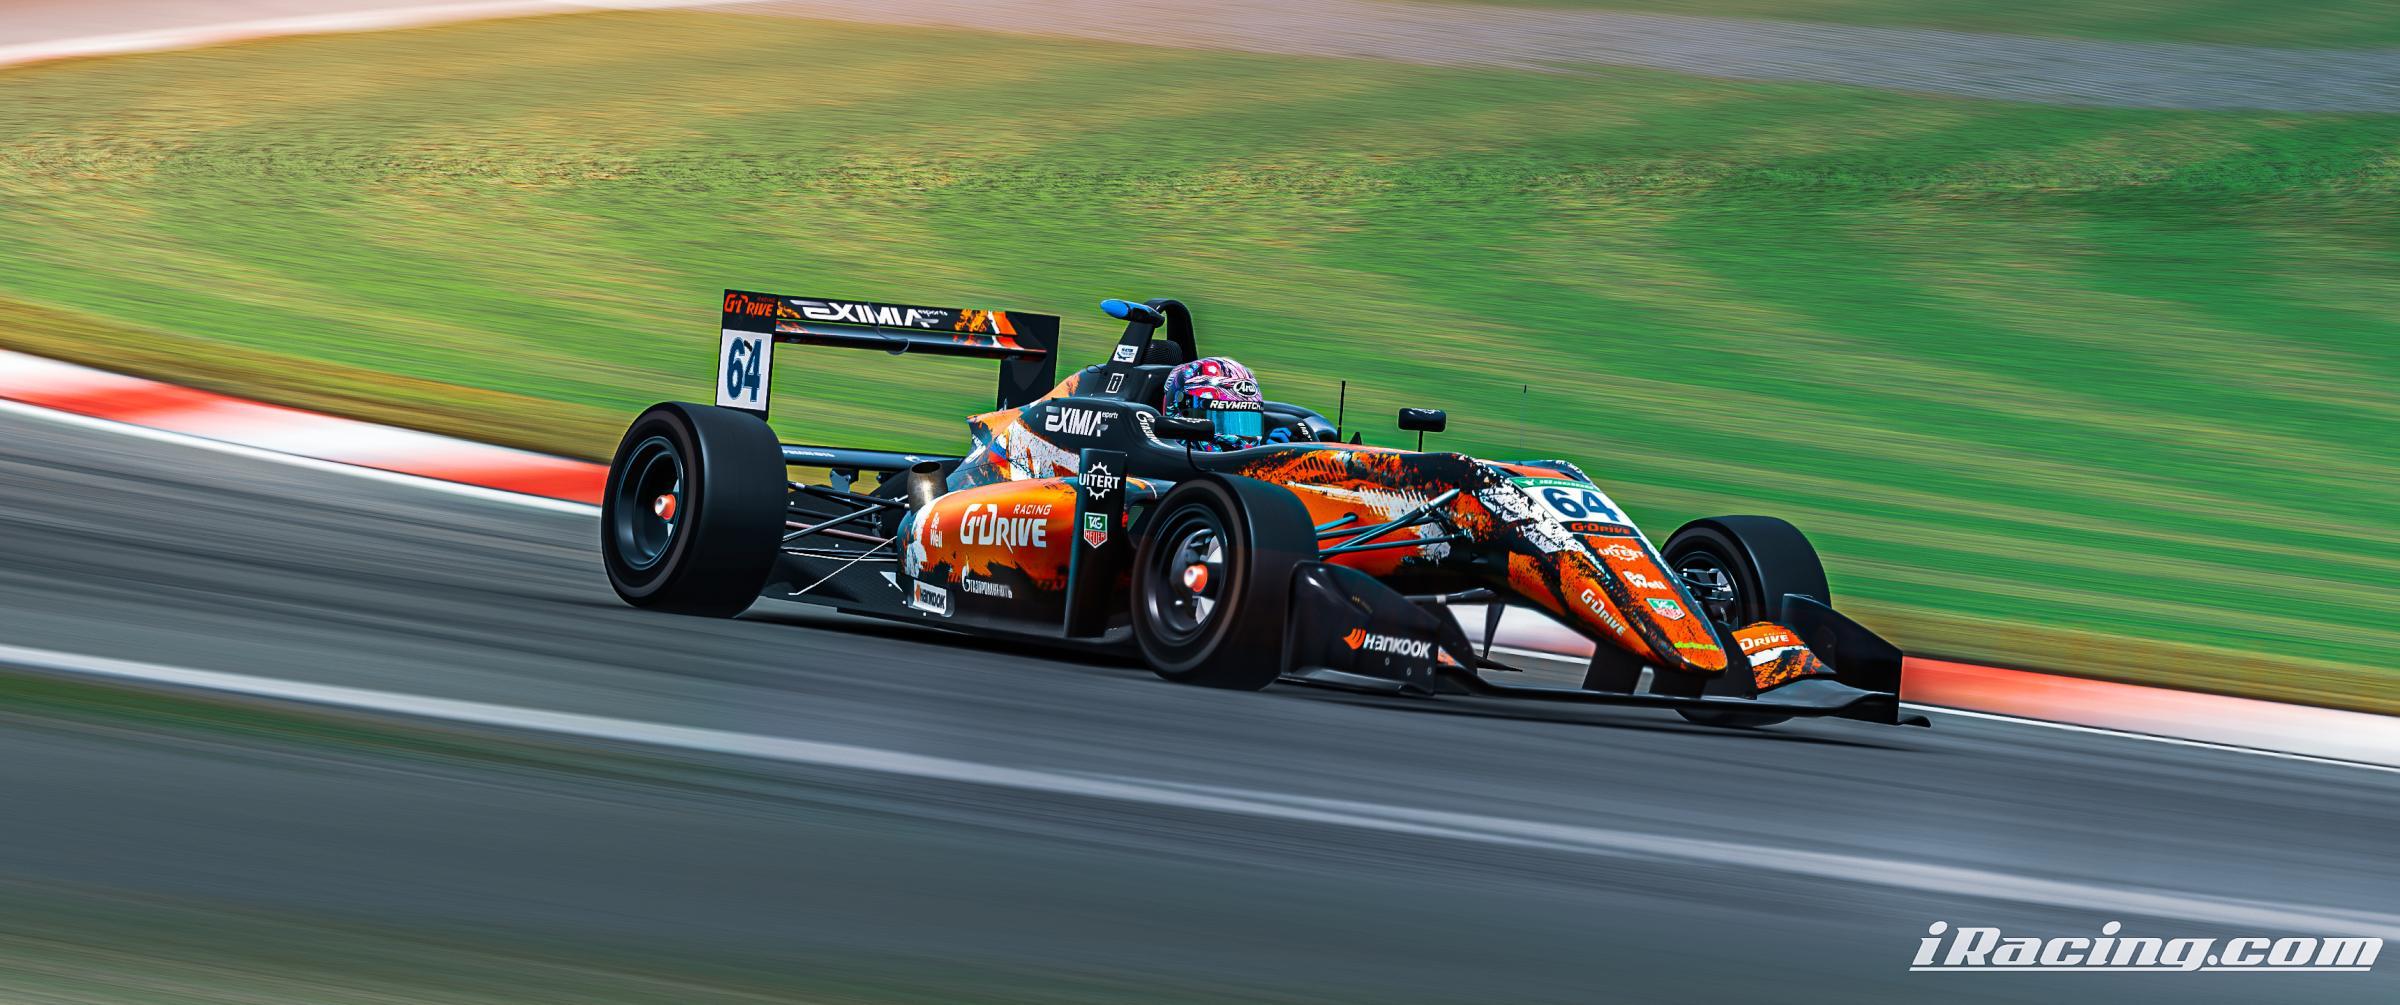 Preview of G-Drive Racing Dallara F3 by Roman Rusinov